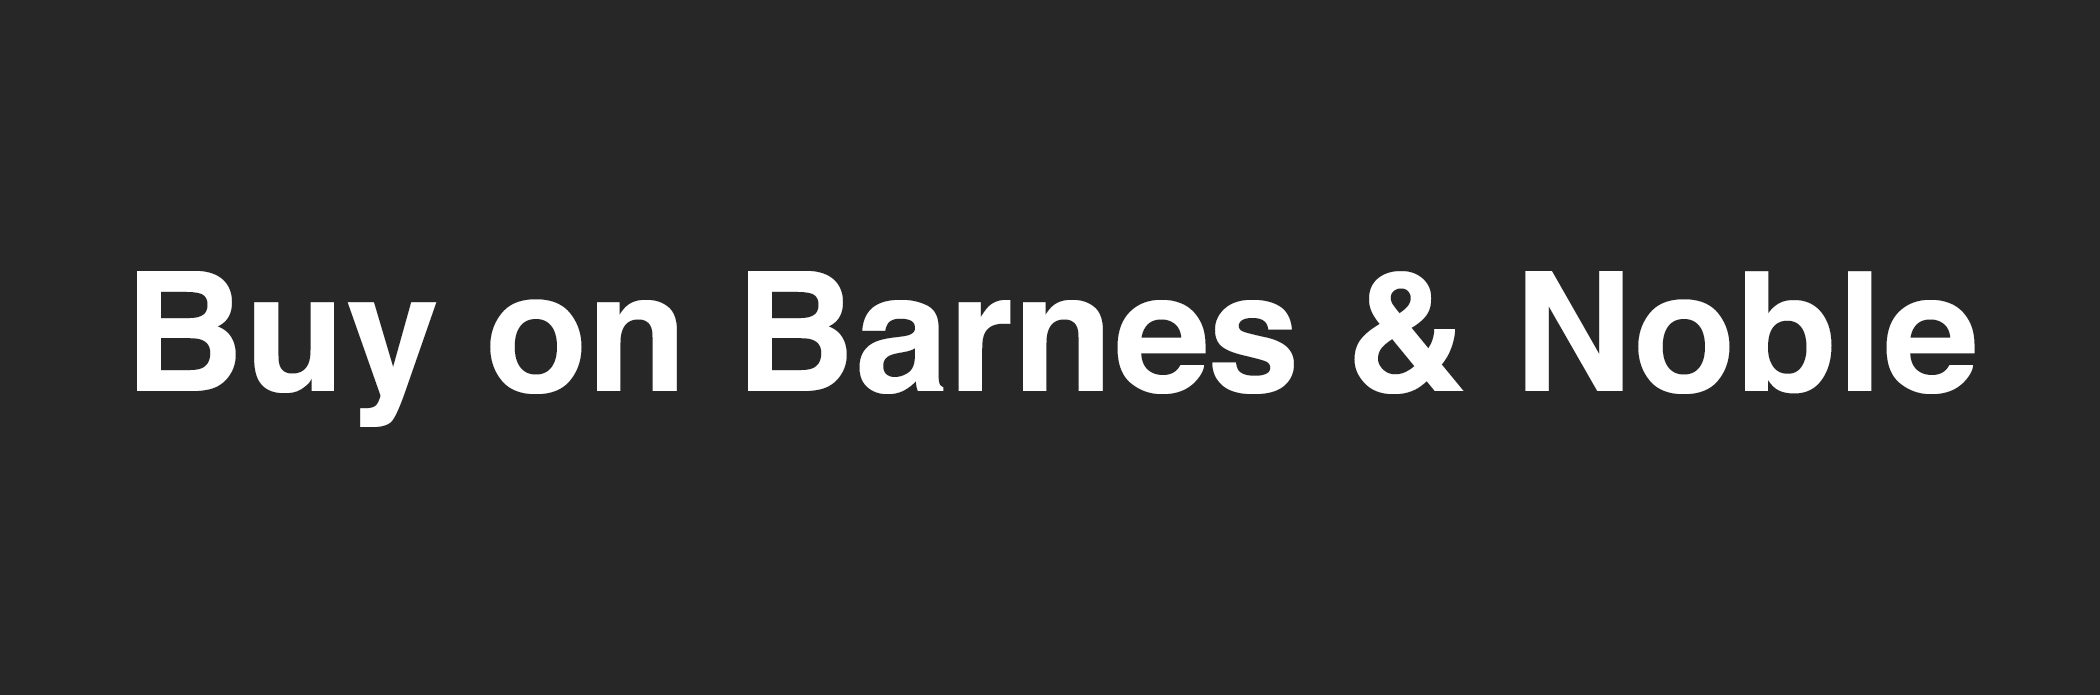 BarnesandNoble C.jpg